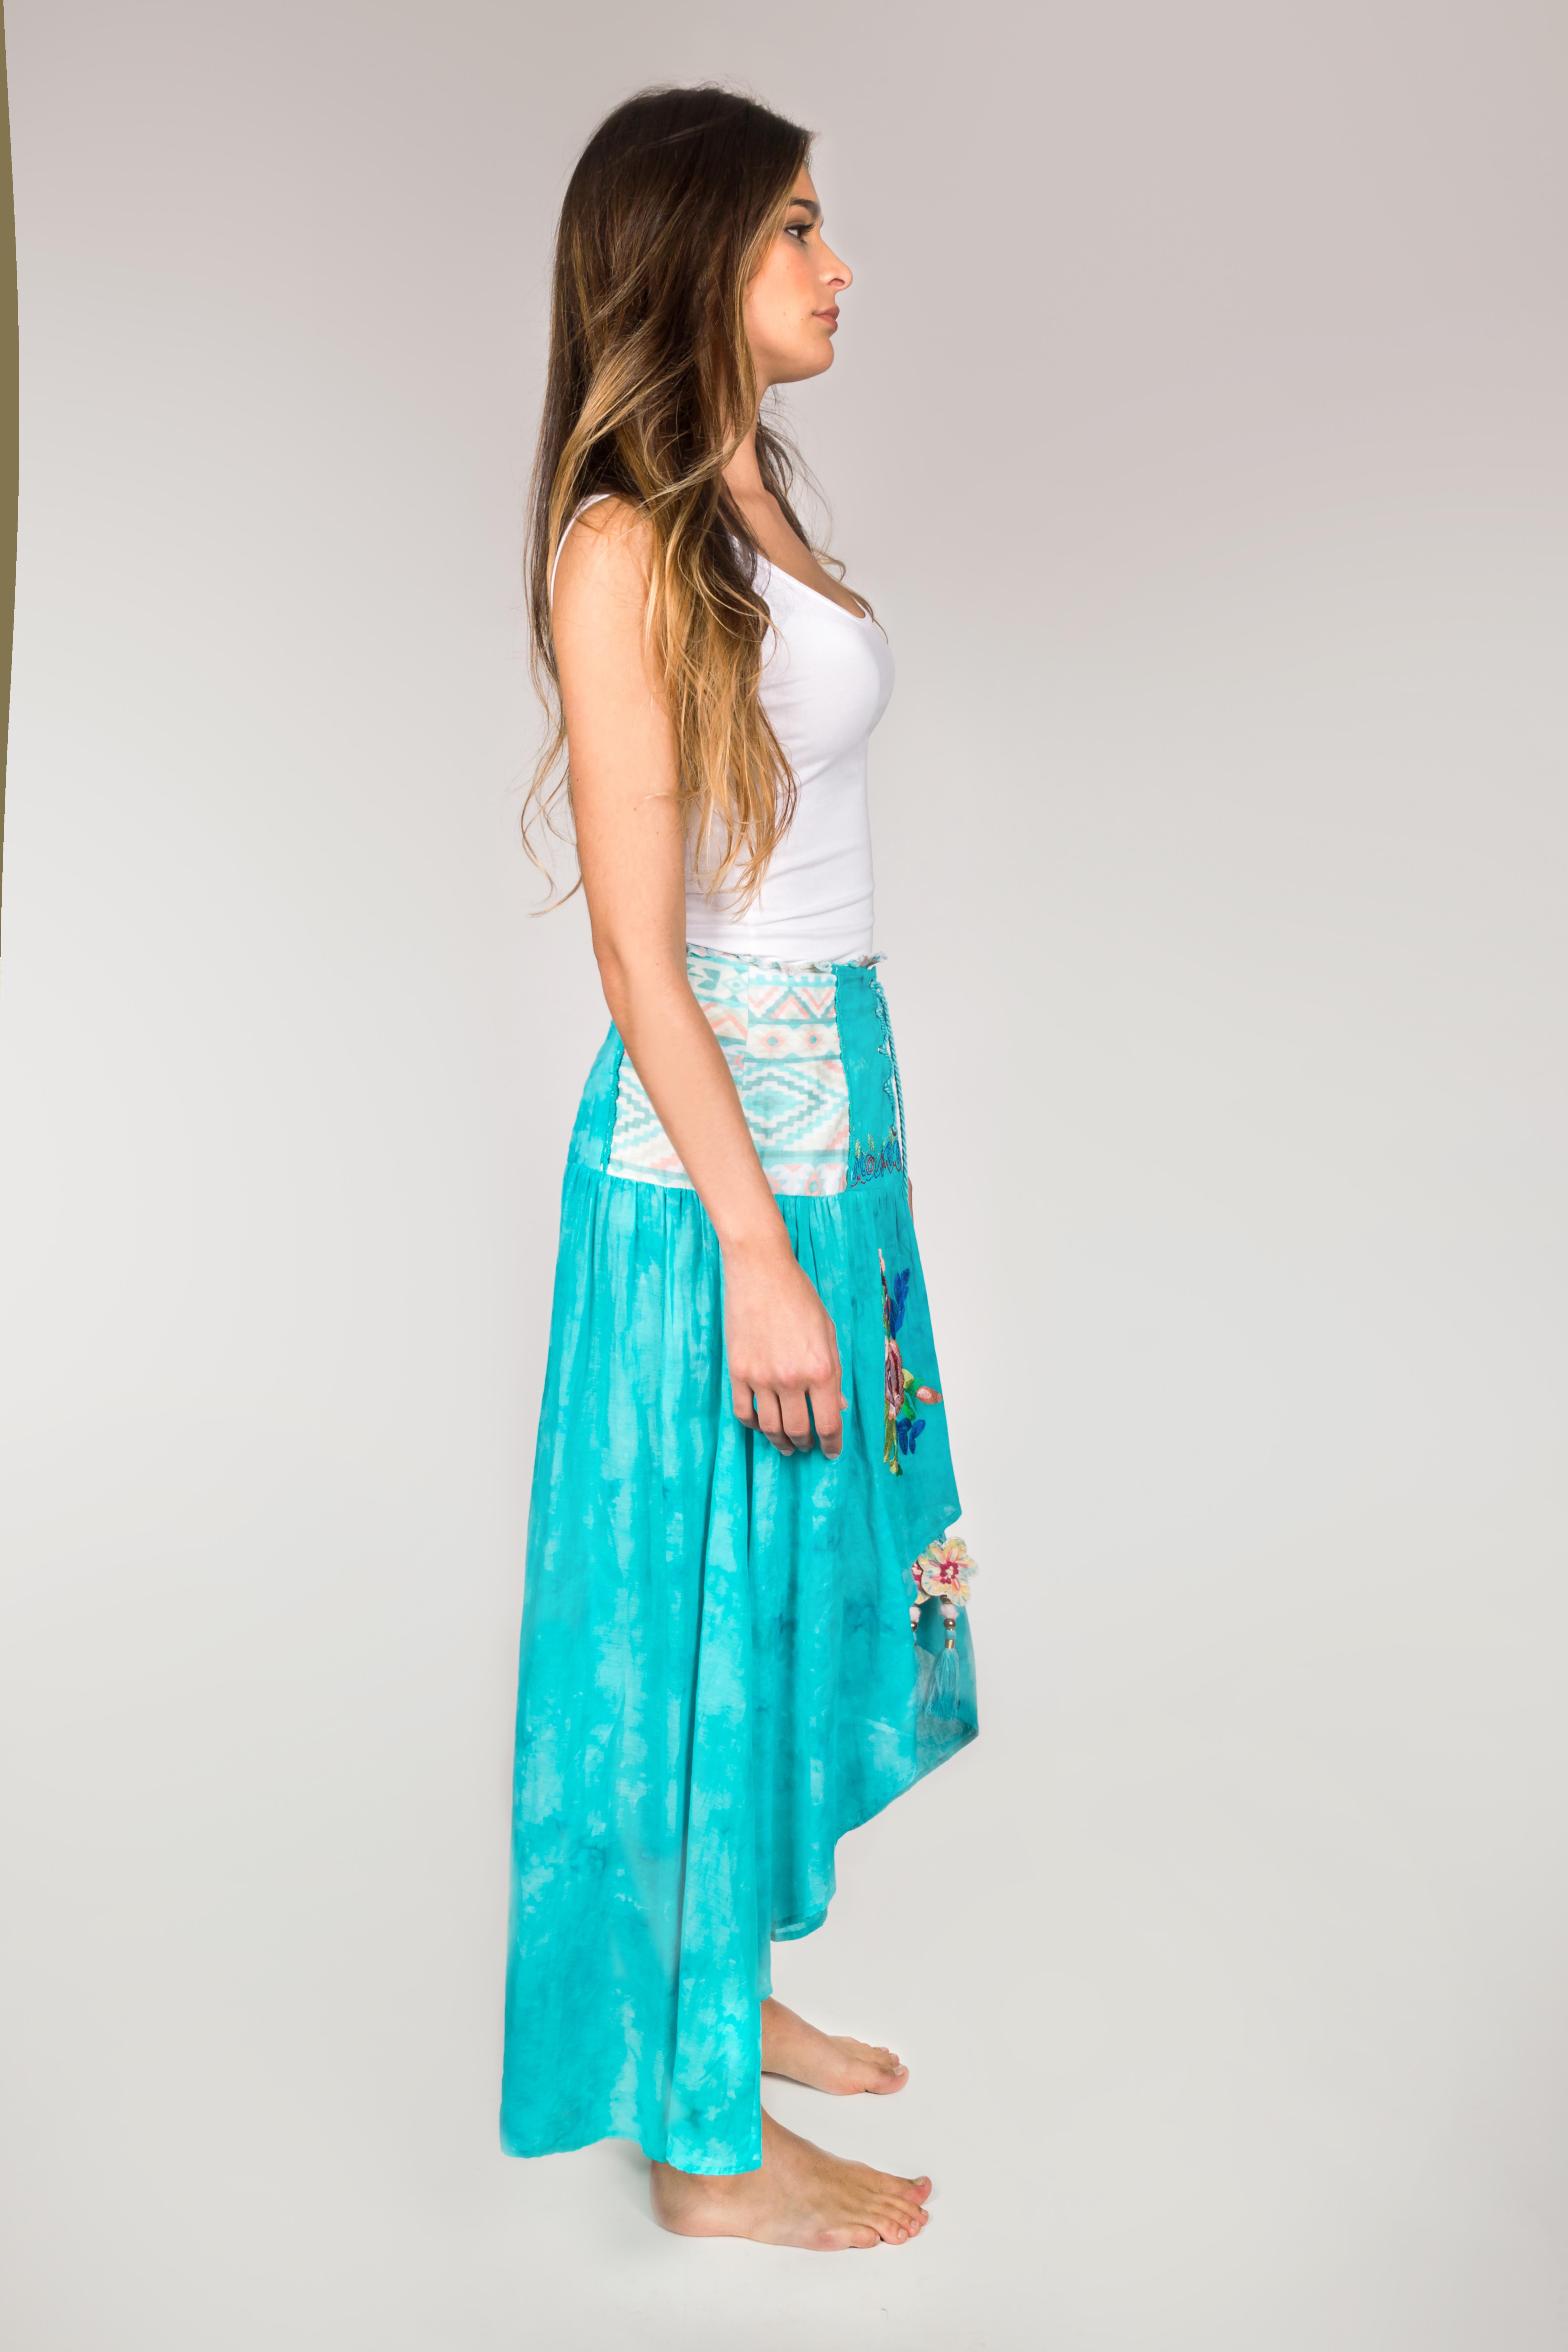 Shoklett: High Low Corset Waist Sea Flower Skirt Sherlyn